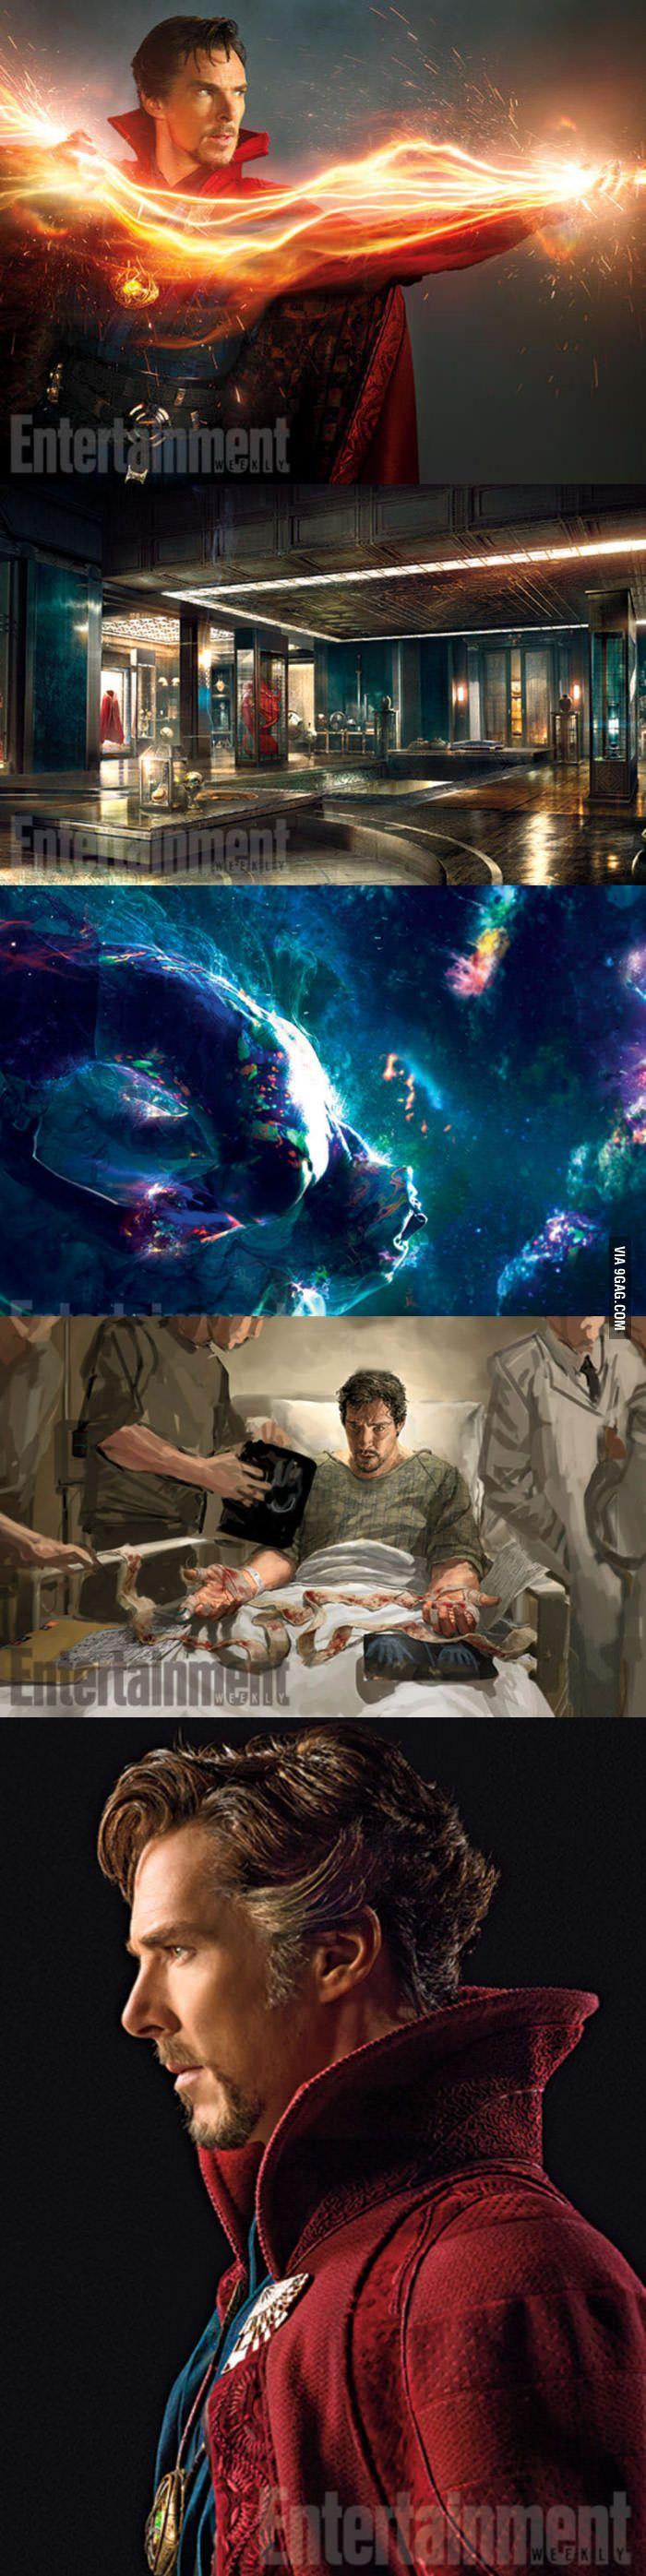 New photos from Marvel's Doctor Strange! AGDFSIDFJASDFJ